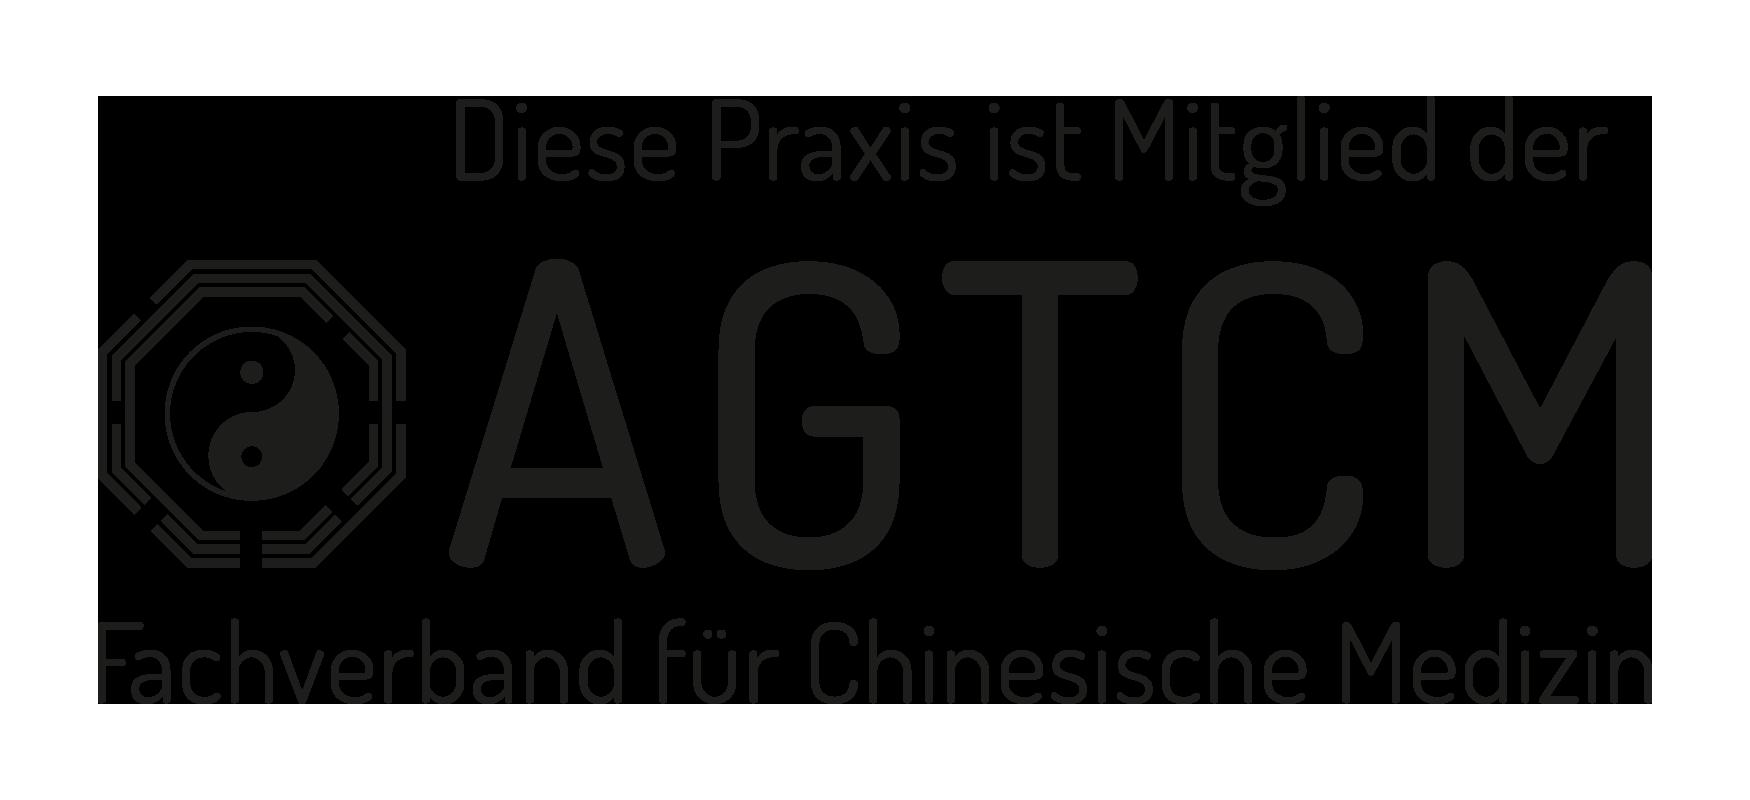 AGTCM Logo